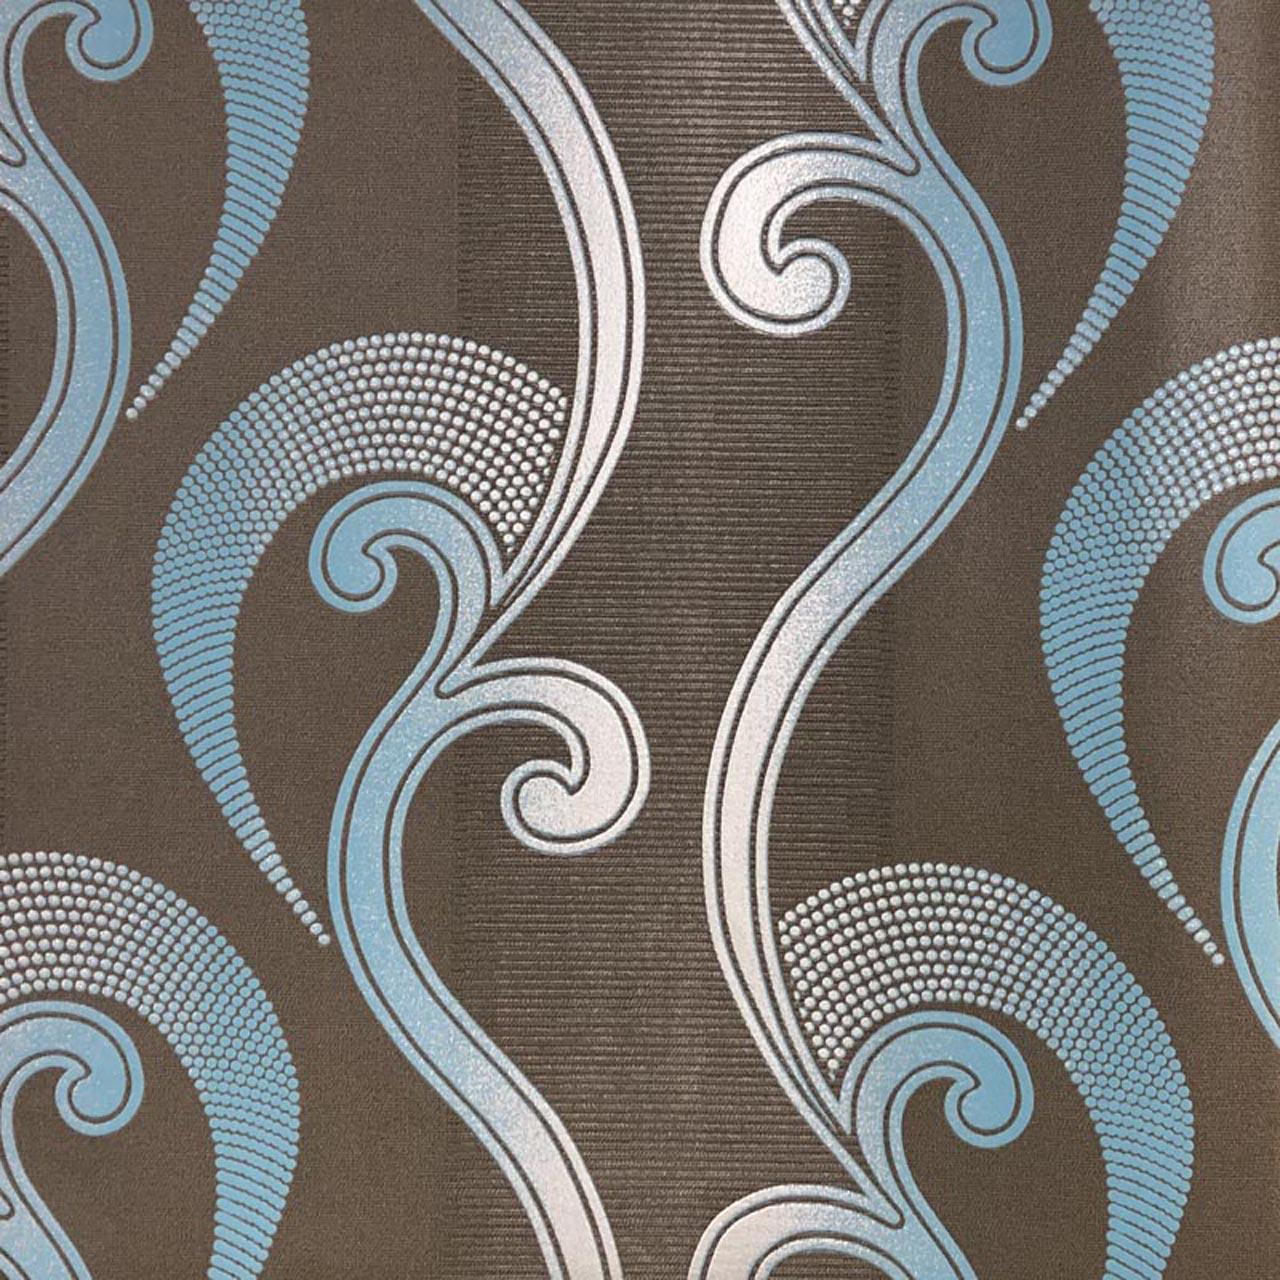 قیمت کاغذ دیواری اریسمان کد ۹۶۷۷۱۸